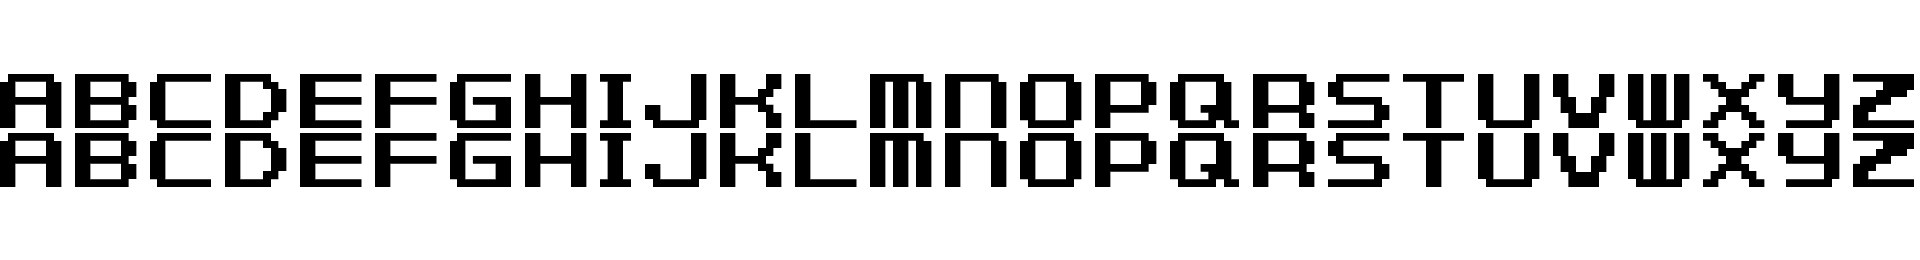 F-Zero GBA Text 1